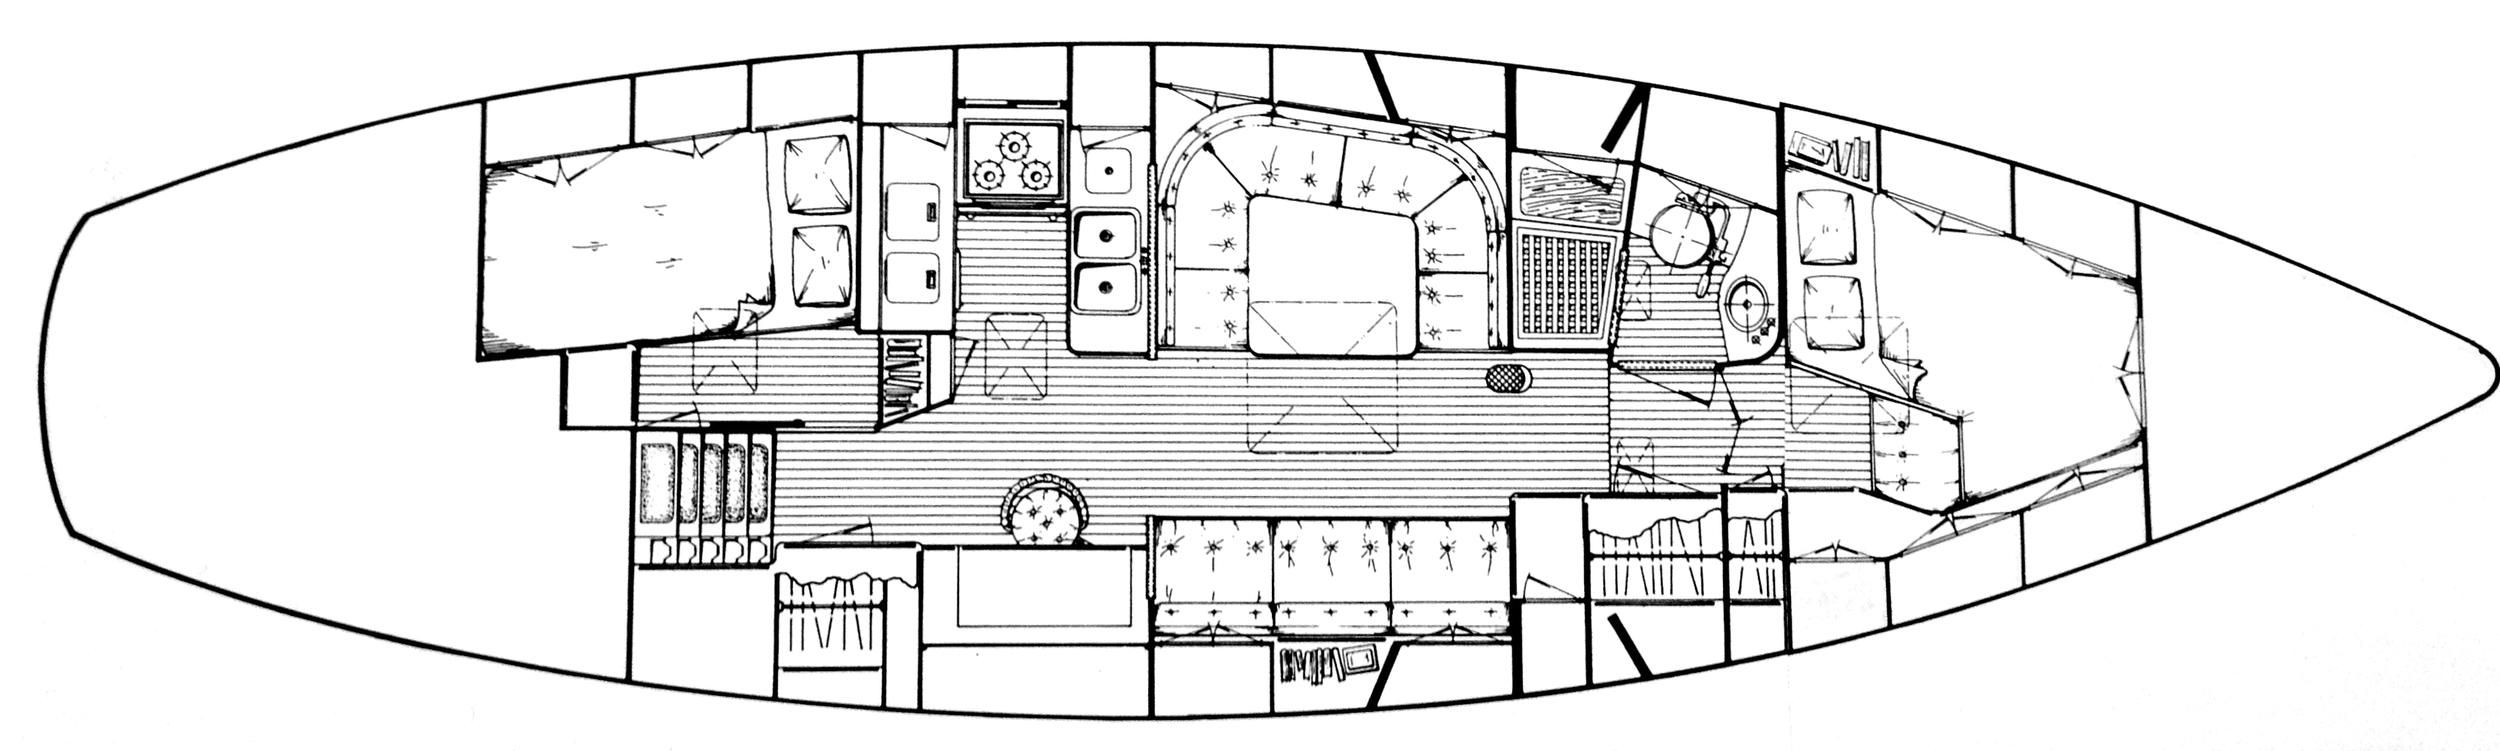 Oh Joy II's interior configuration.